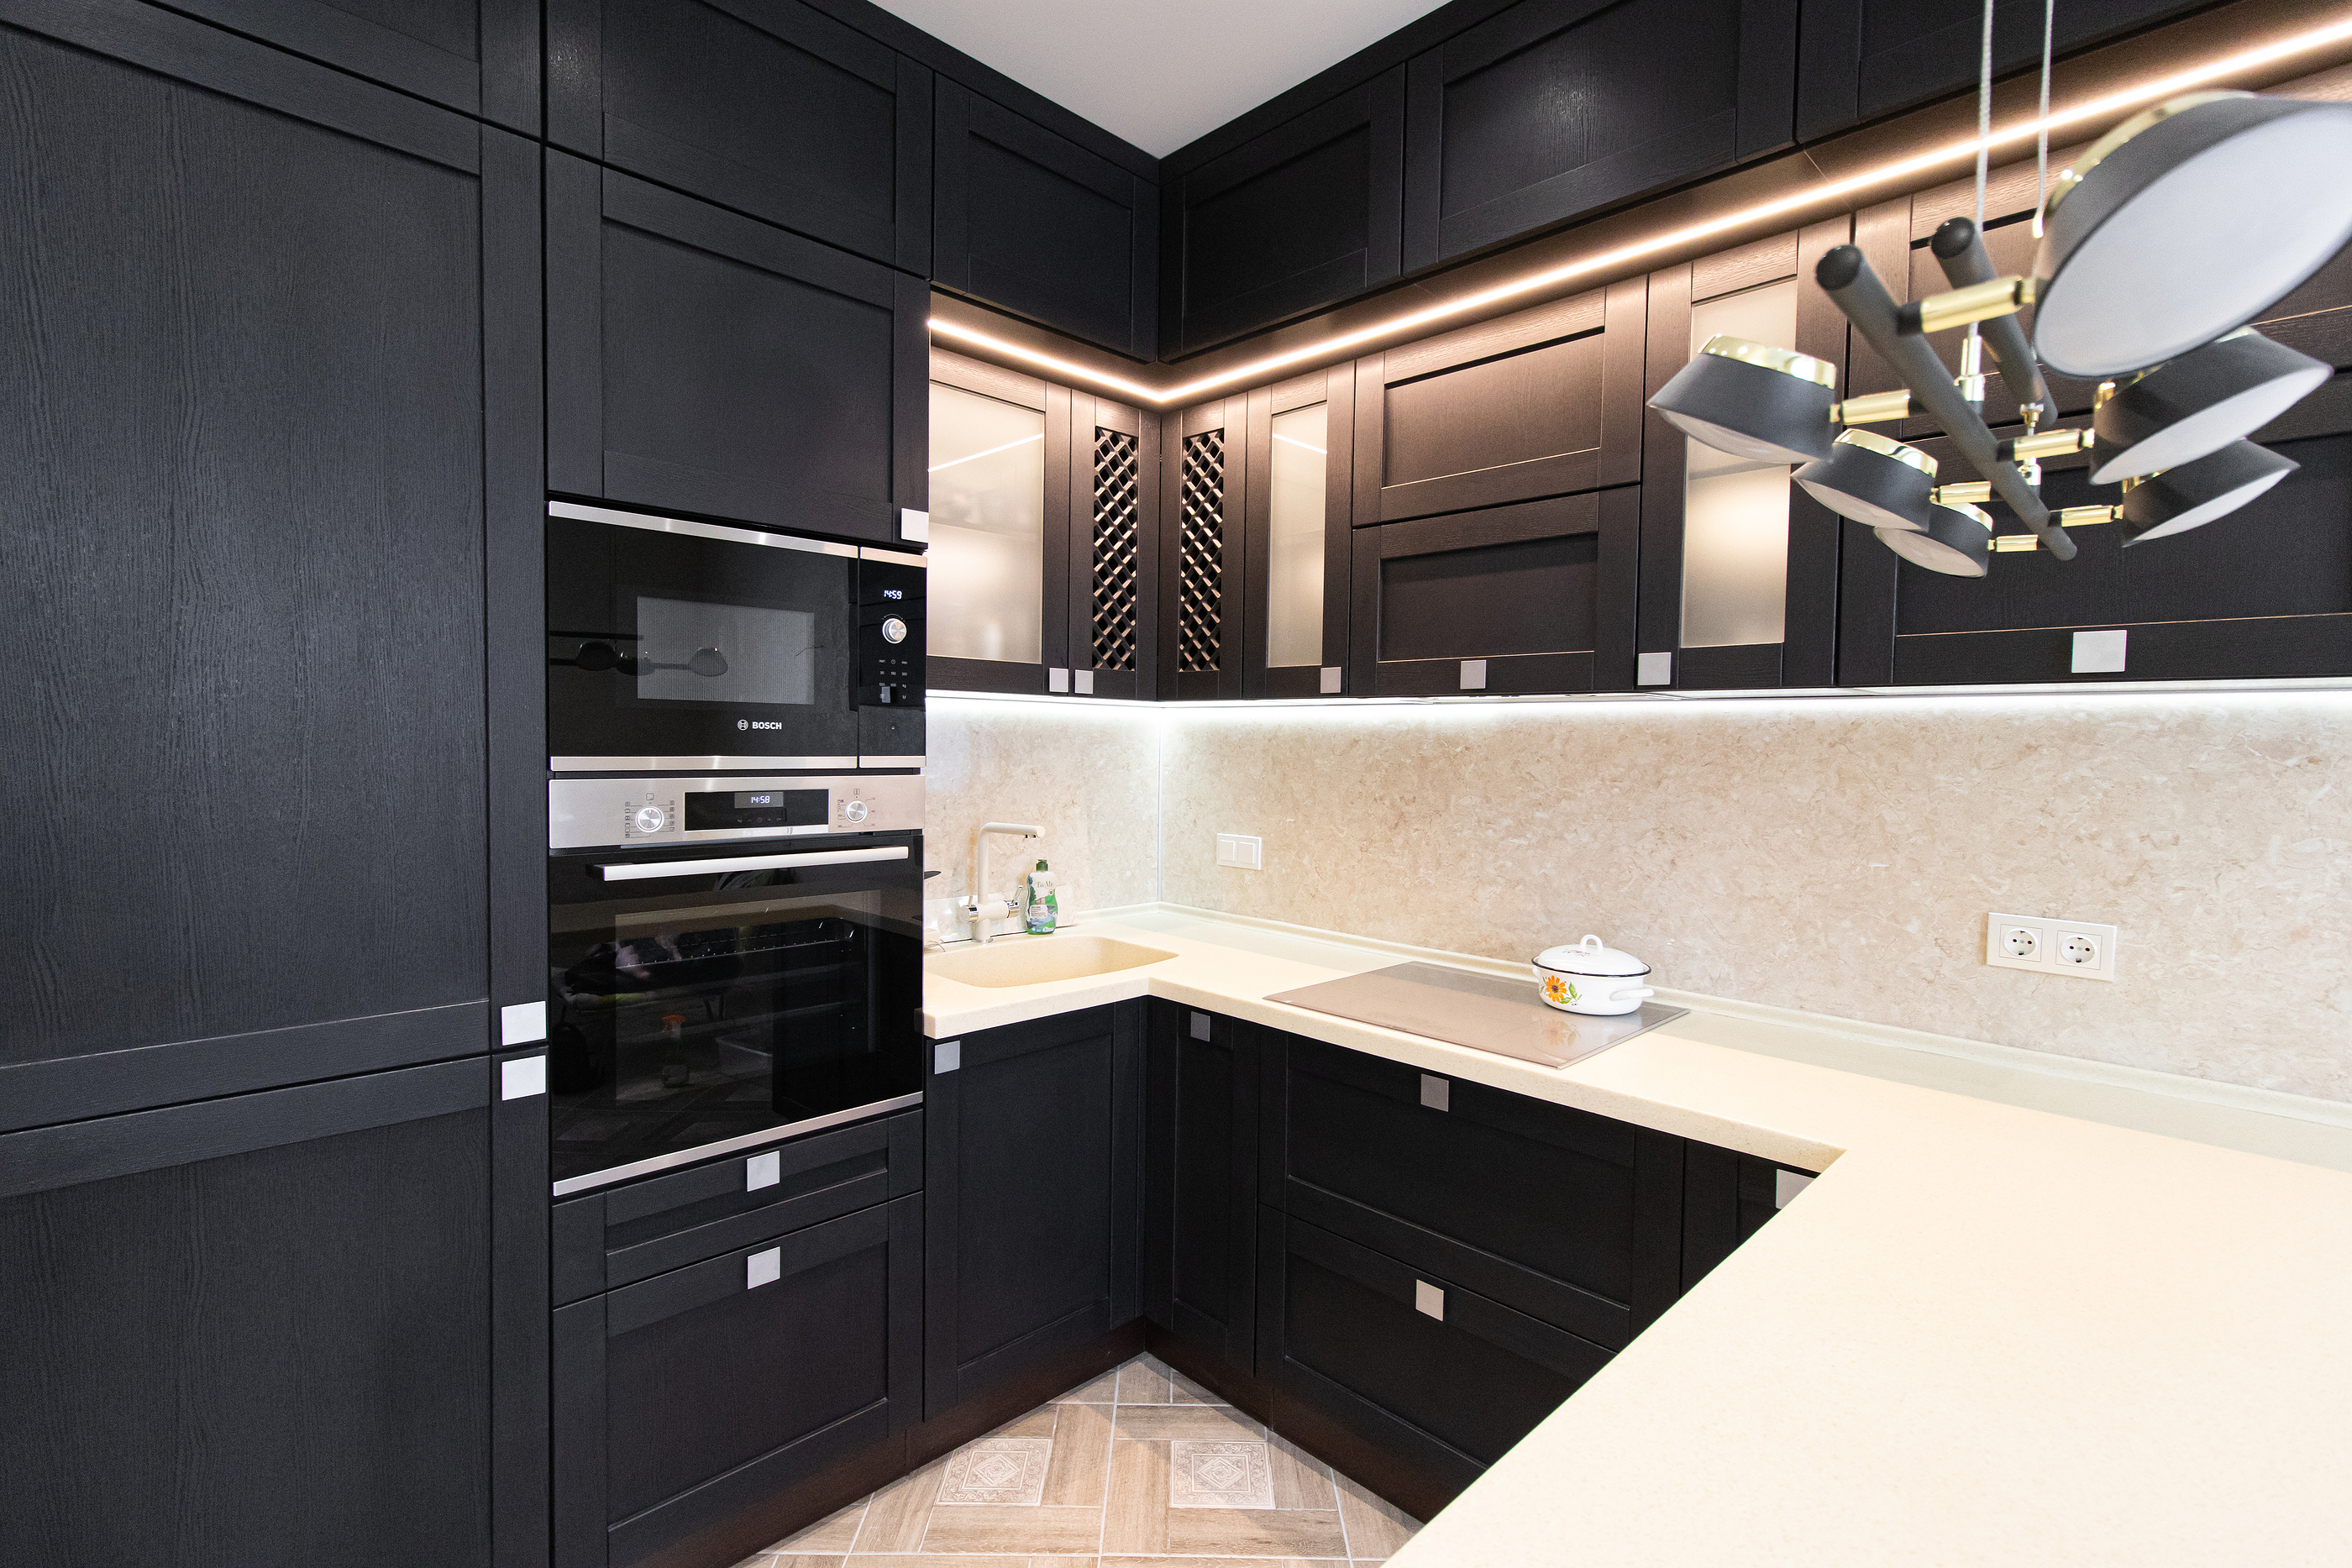 bigstock-modern-kitchen-made-of-solid-b-397268303.jpg